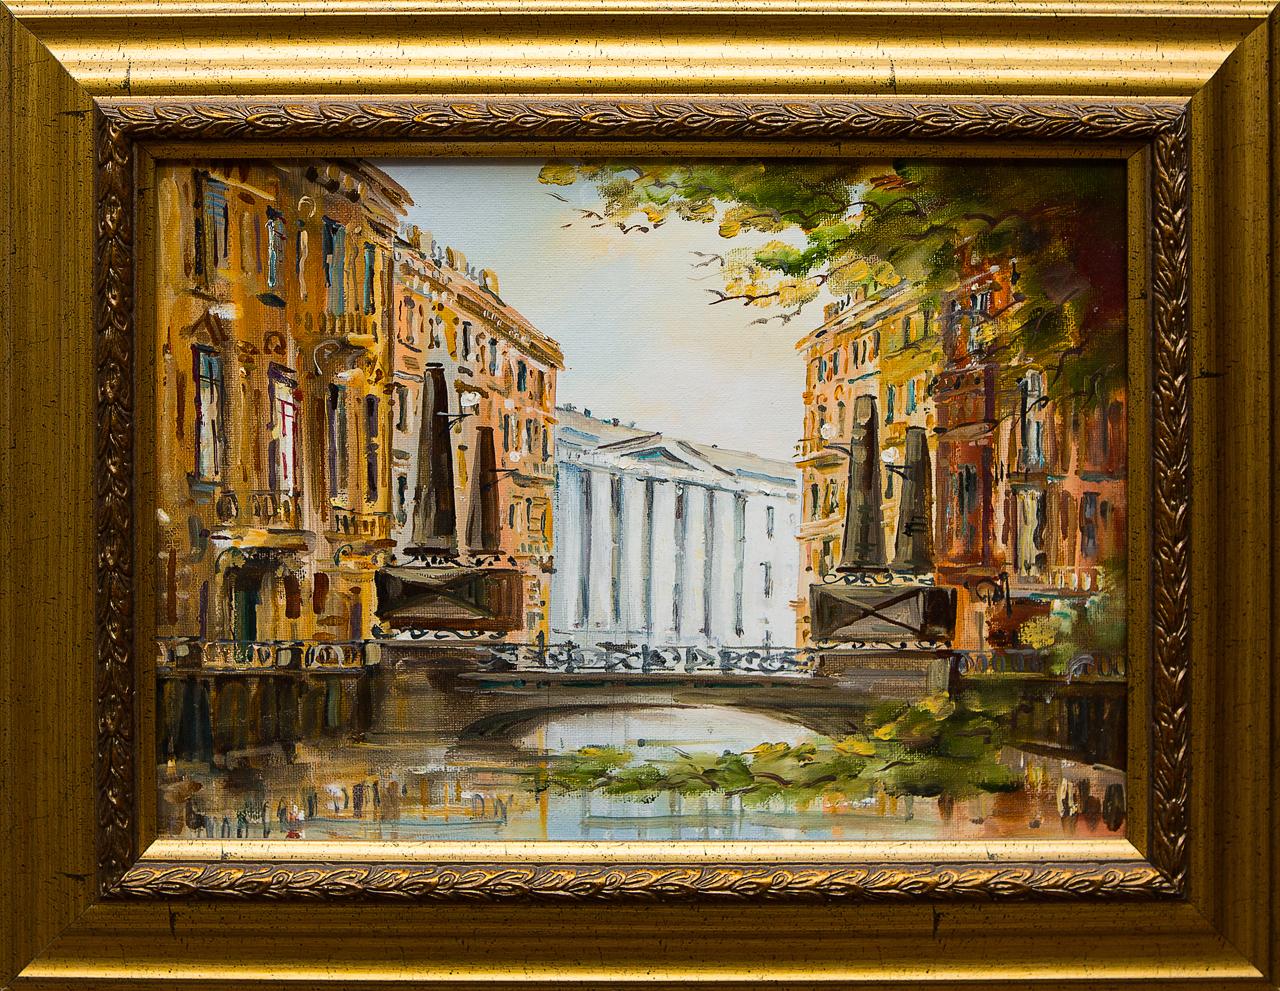 Картина маслом Канал Грибоедова Шеренкова картина маслом европа шеренкова